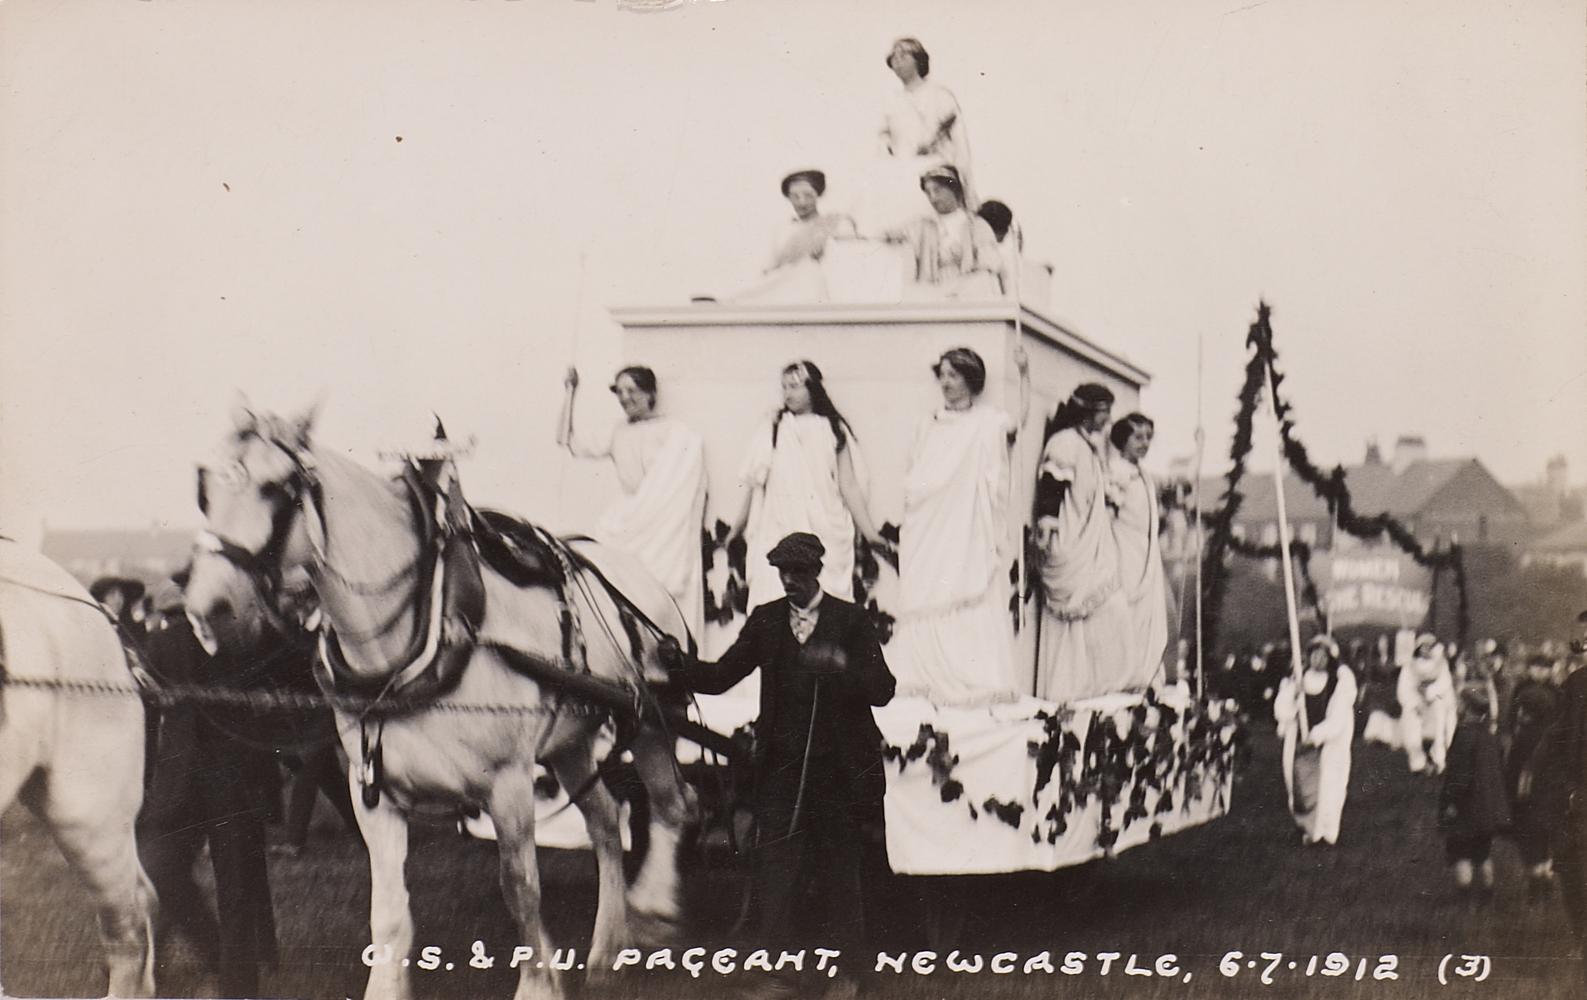 Postcard, WSPU Pageant, Newcastle 6 July 1912